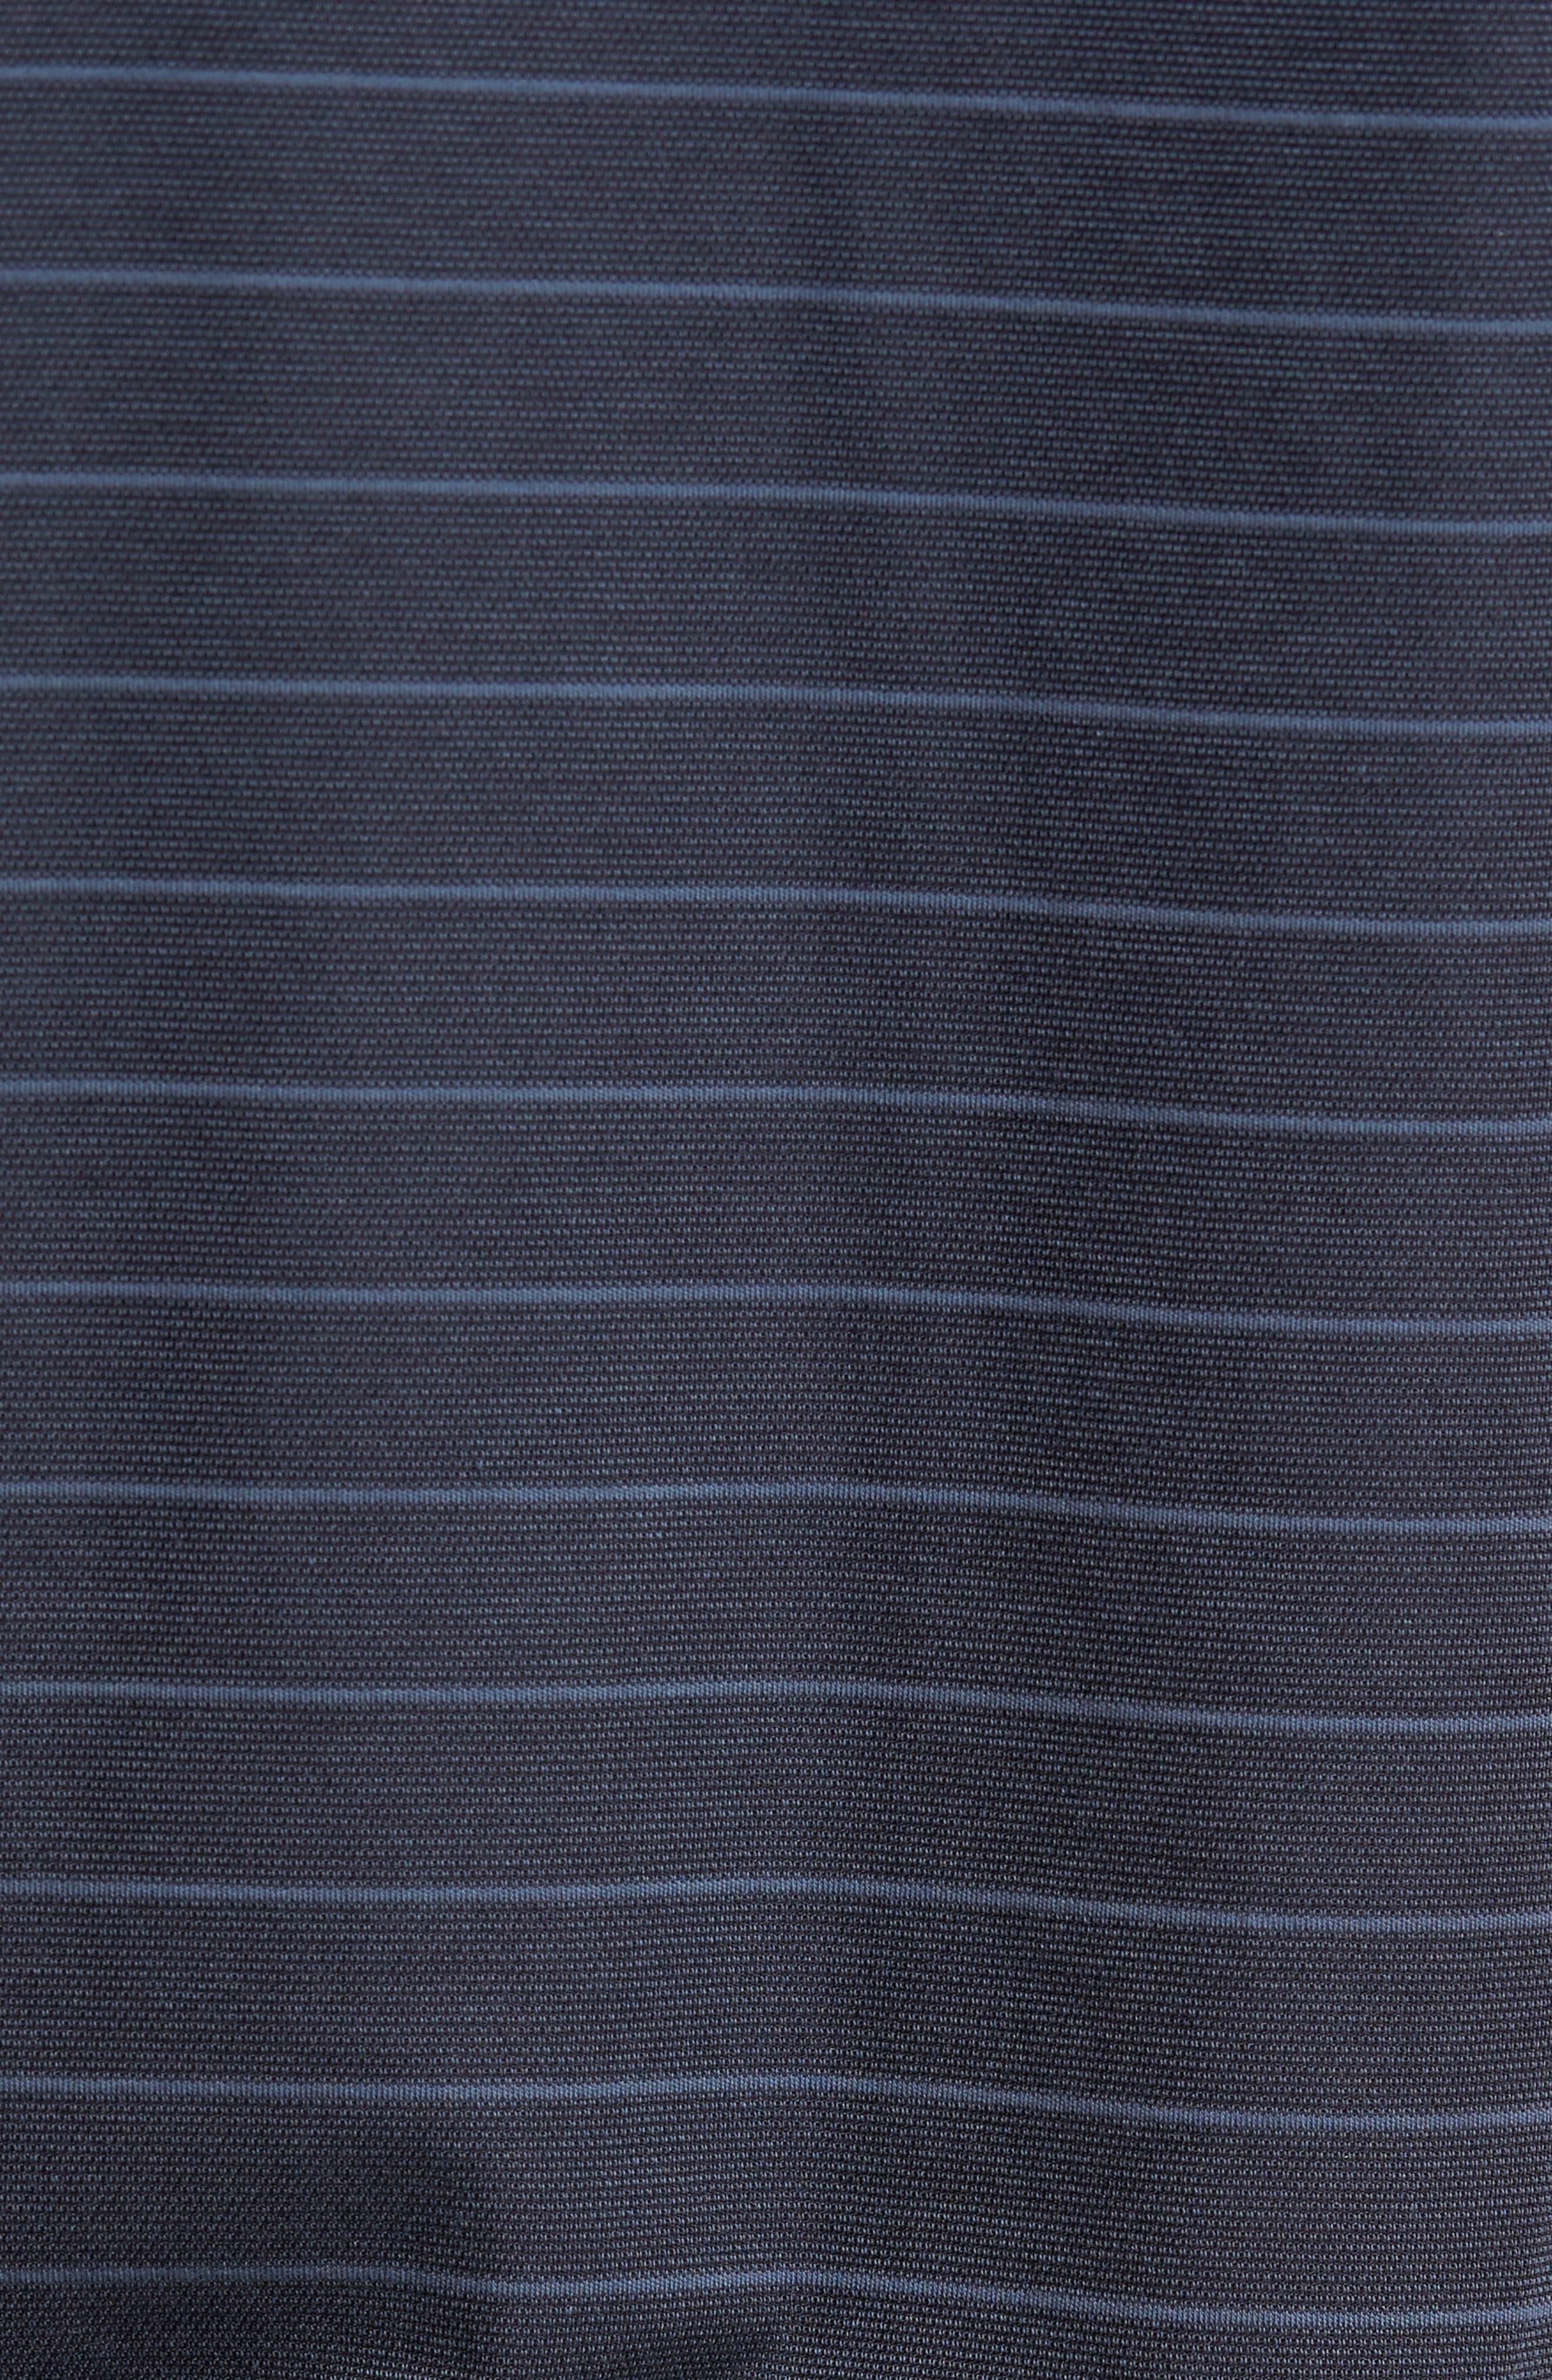 Marini Polo Shirt,                             Alternate thumbnail 5, color,                             BLUE NIGHTS/ ALLURE